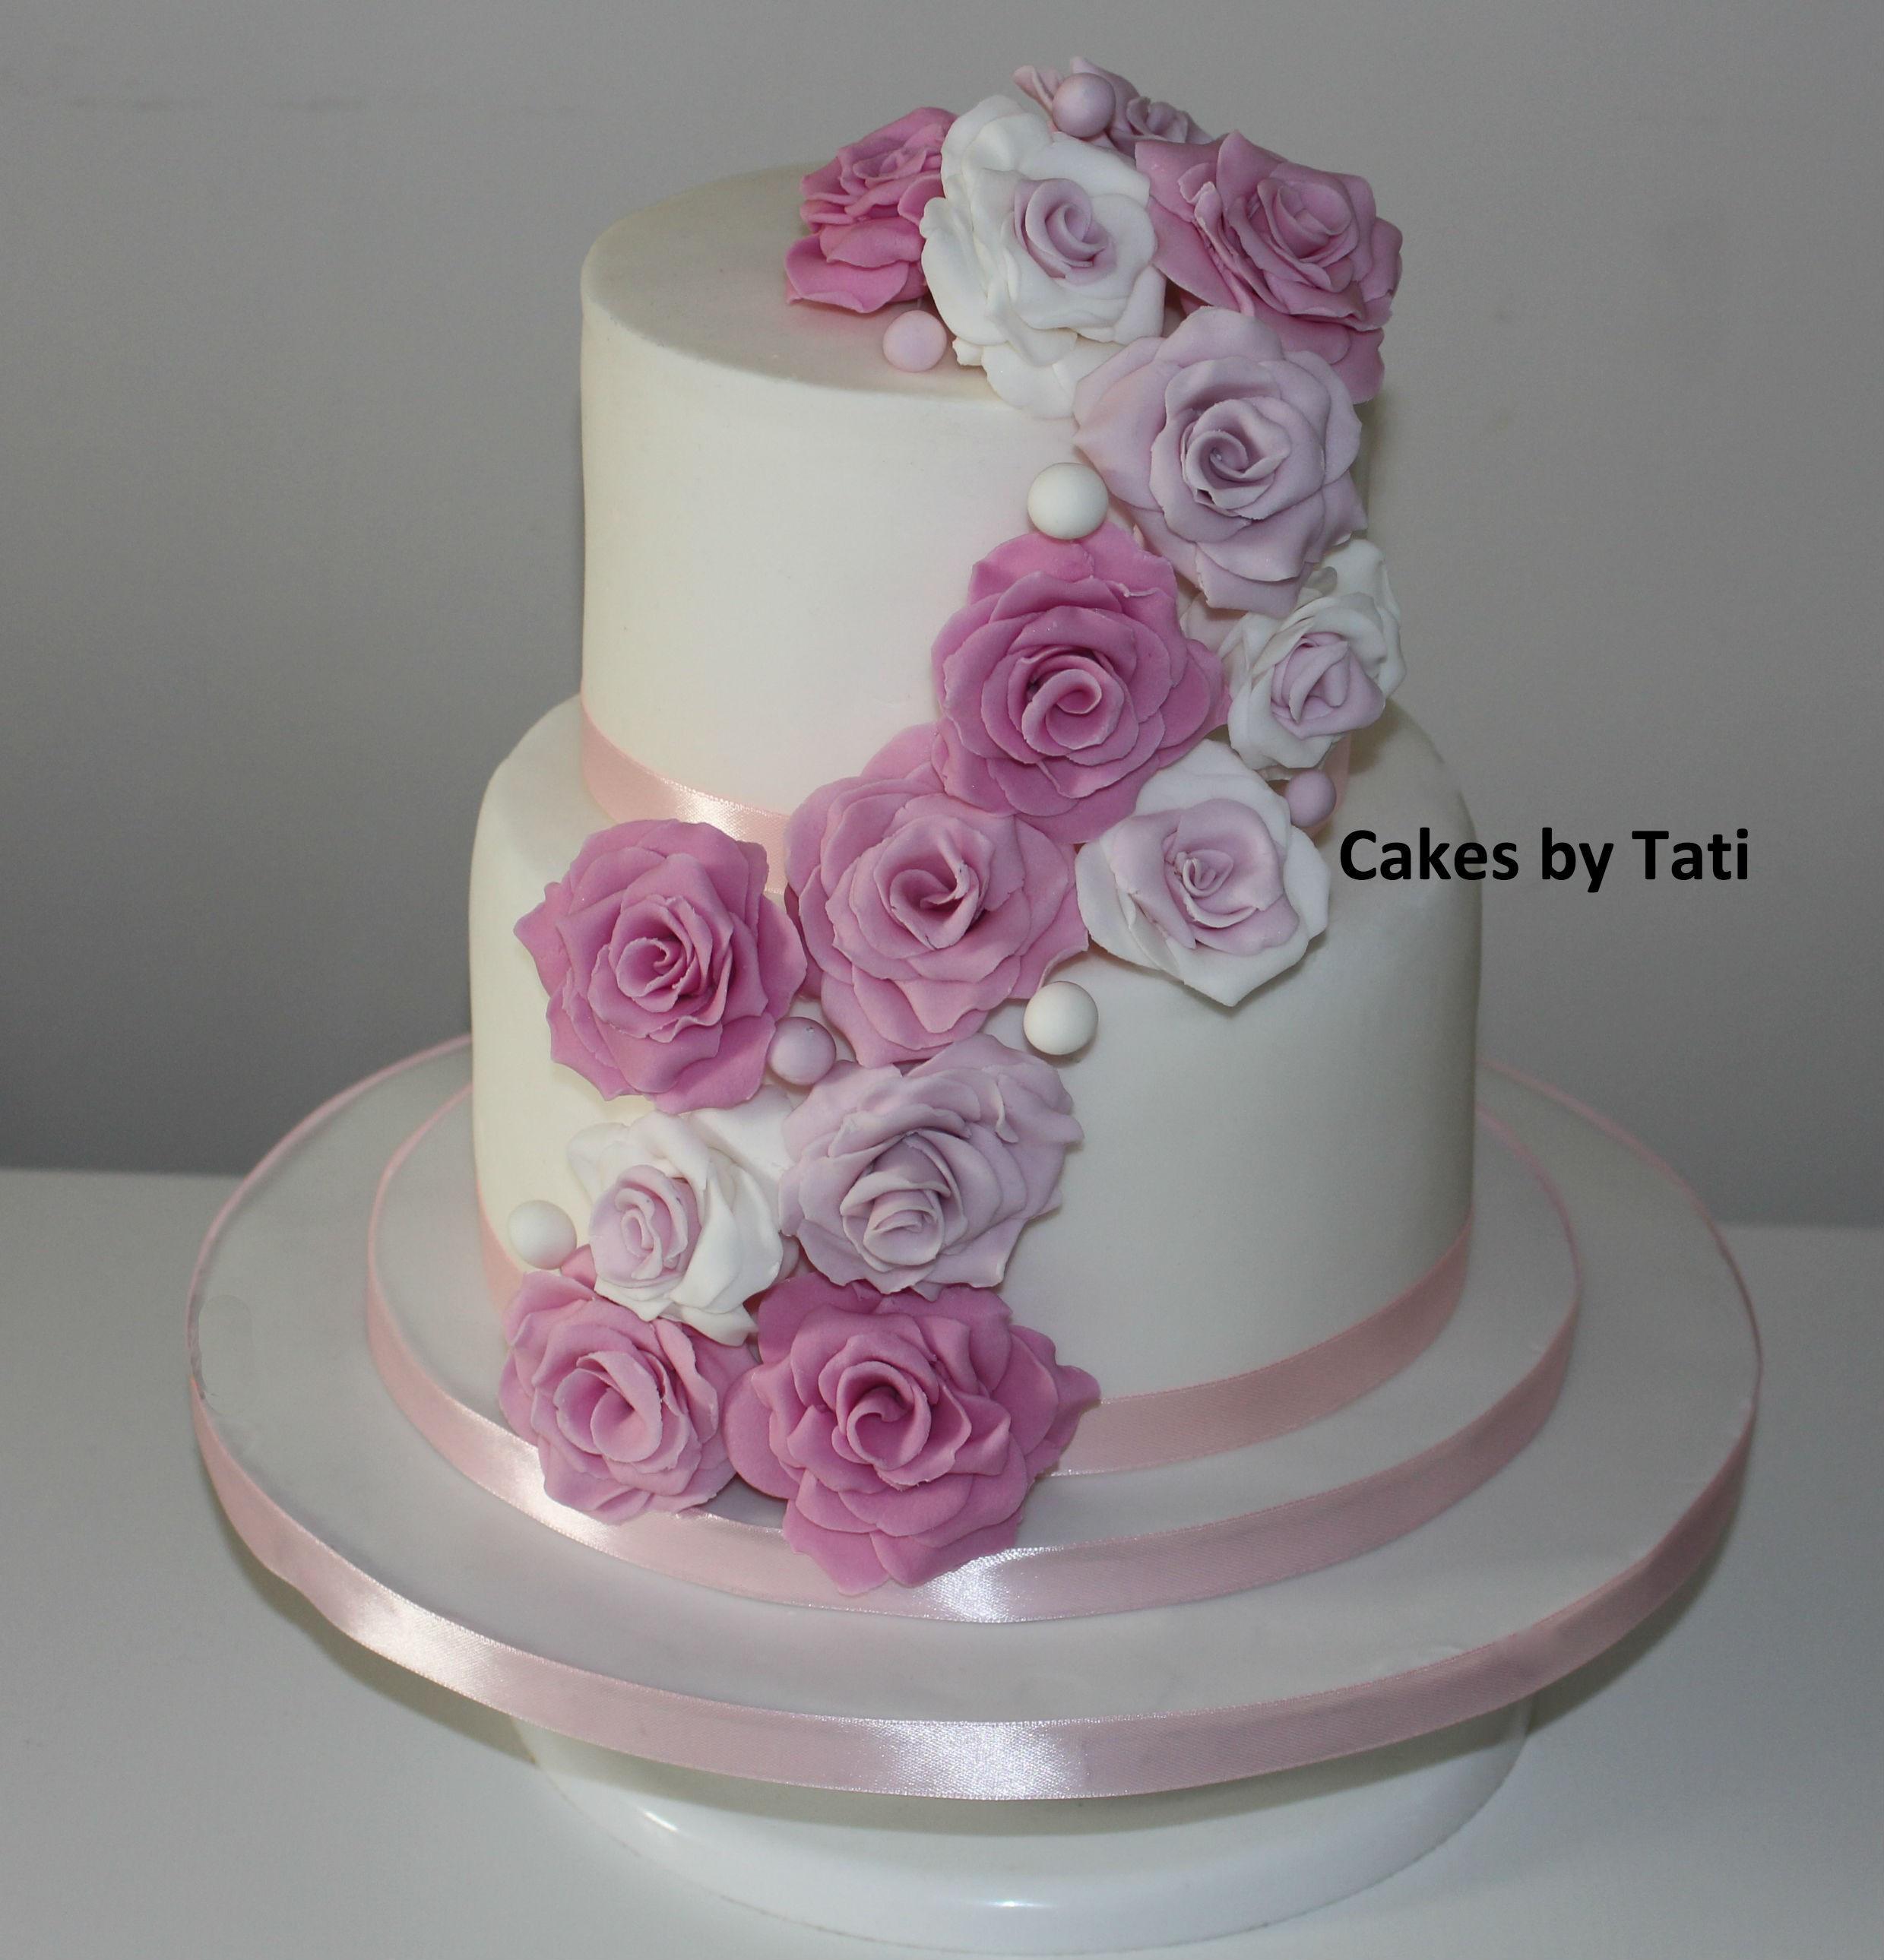 Wedding Cakes 2 Tier  2 TIER ROSE CASCADE WEDDING CAKE Wedding cakes GALLERY